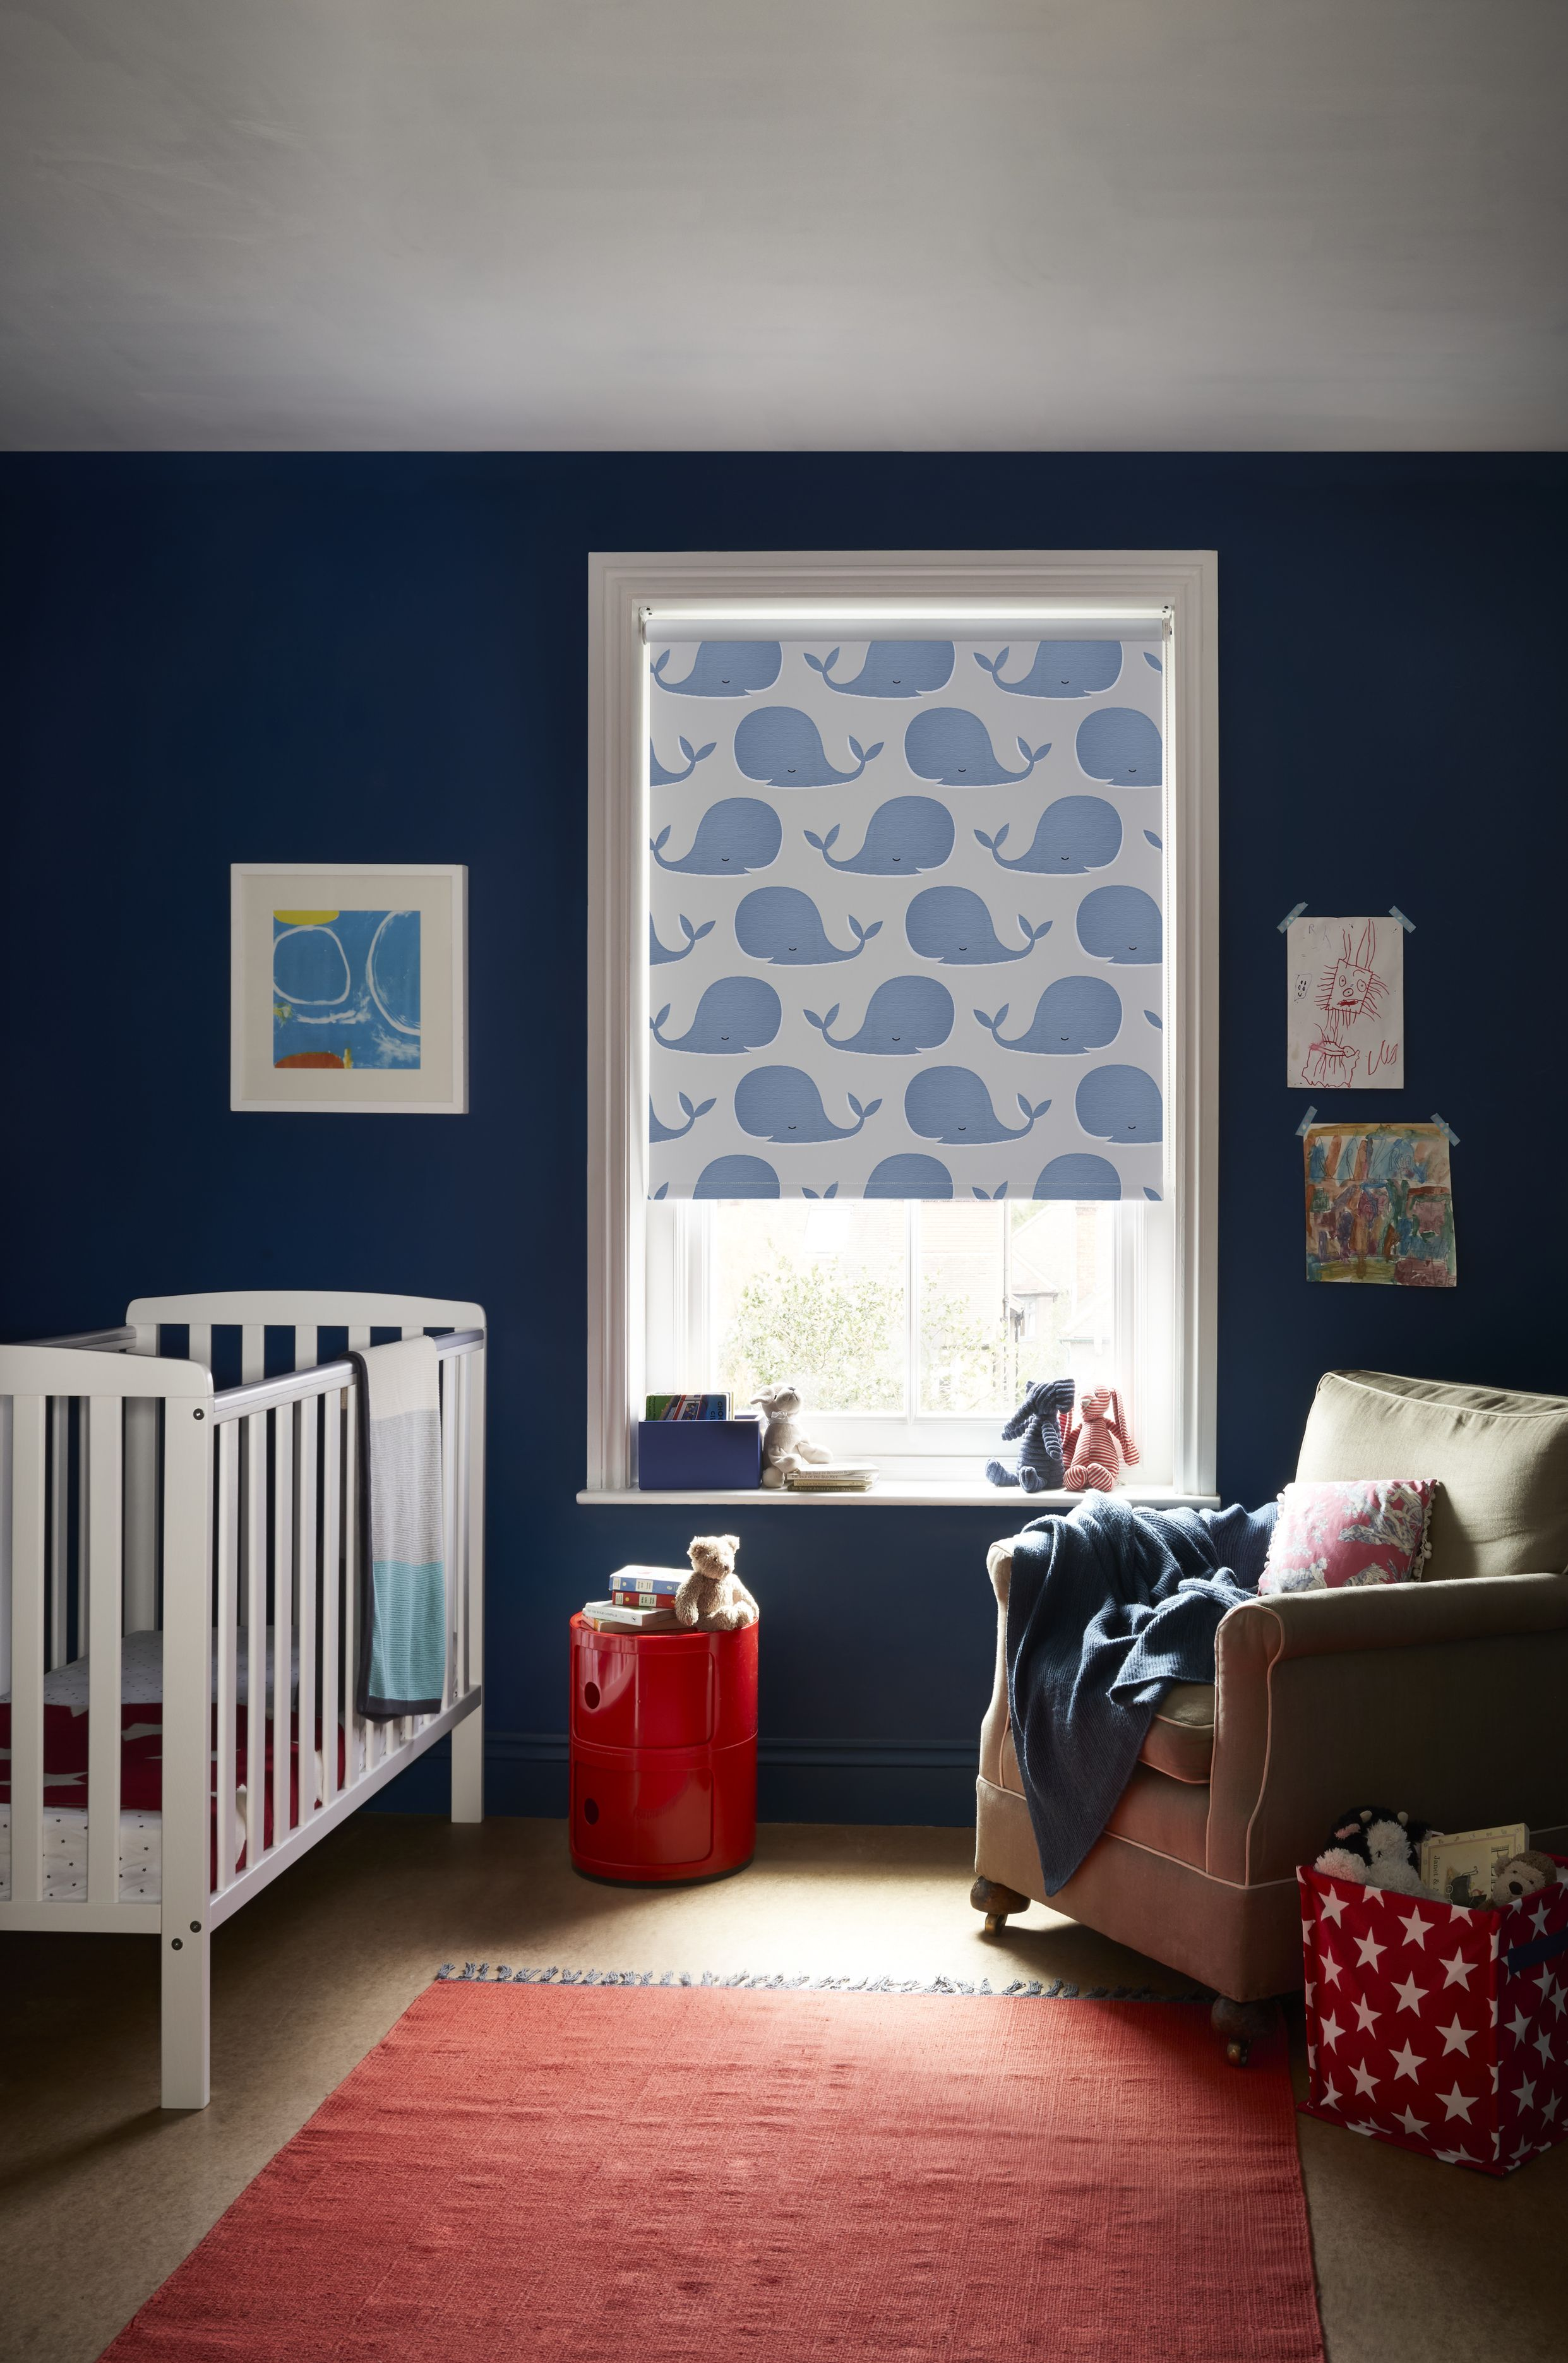 Pin on Children's Bedroom Ideas